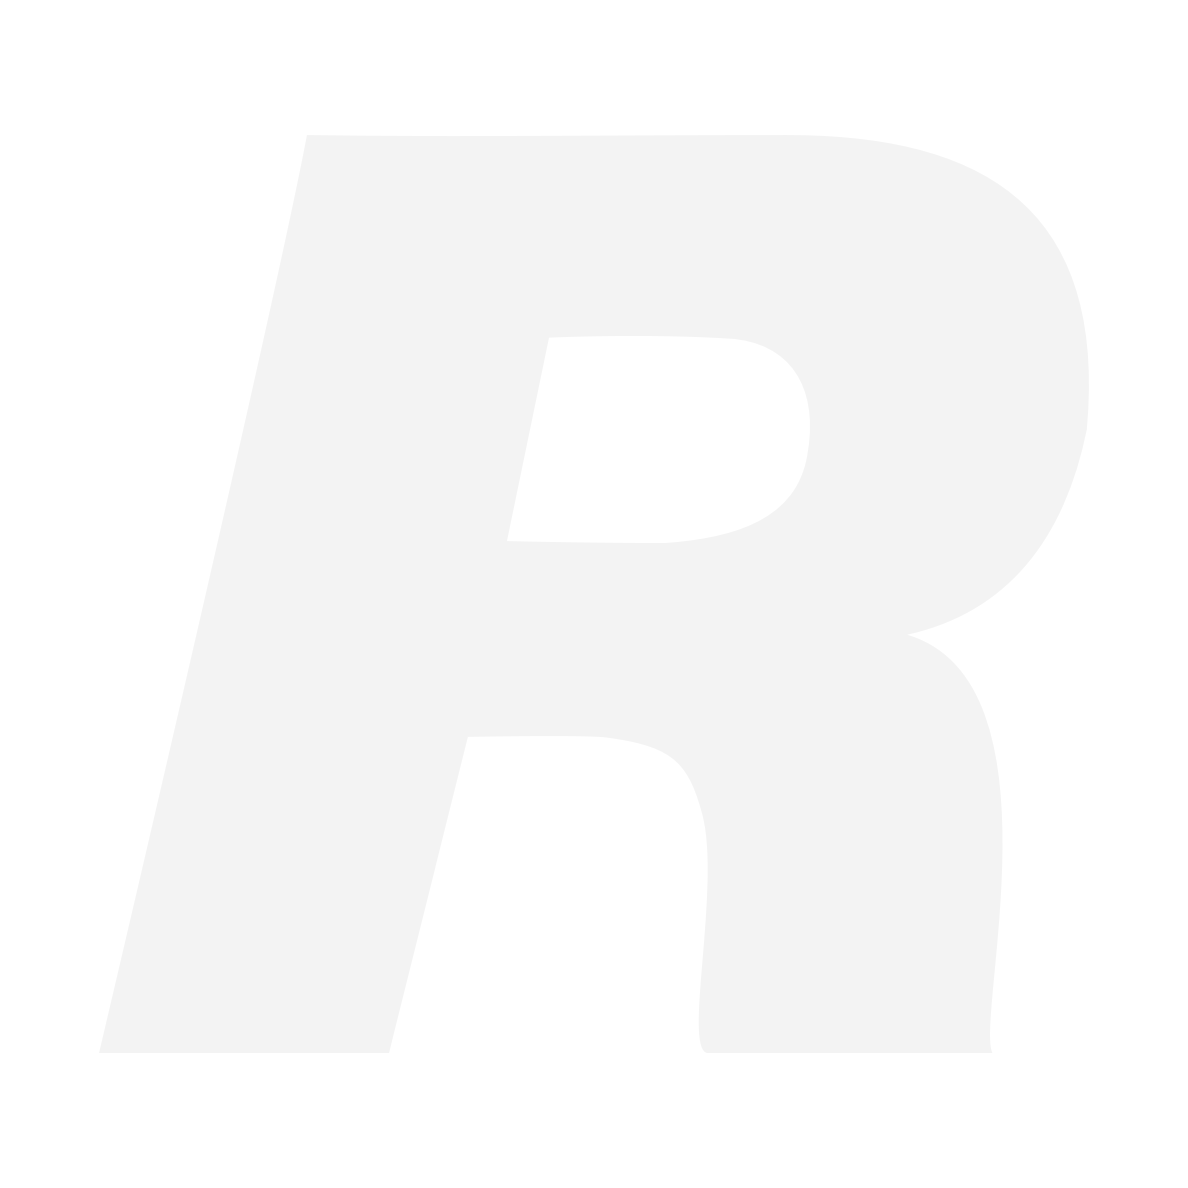 Rollei Sensor Cleaning Set for MFT Cameras